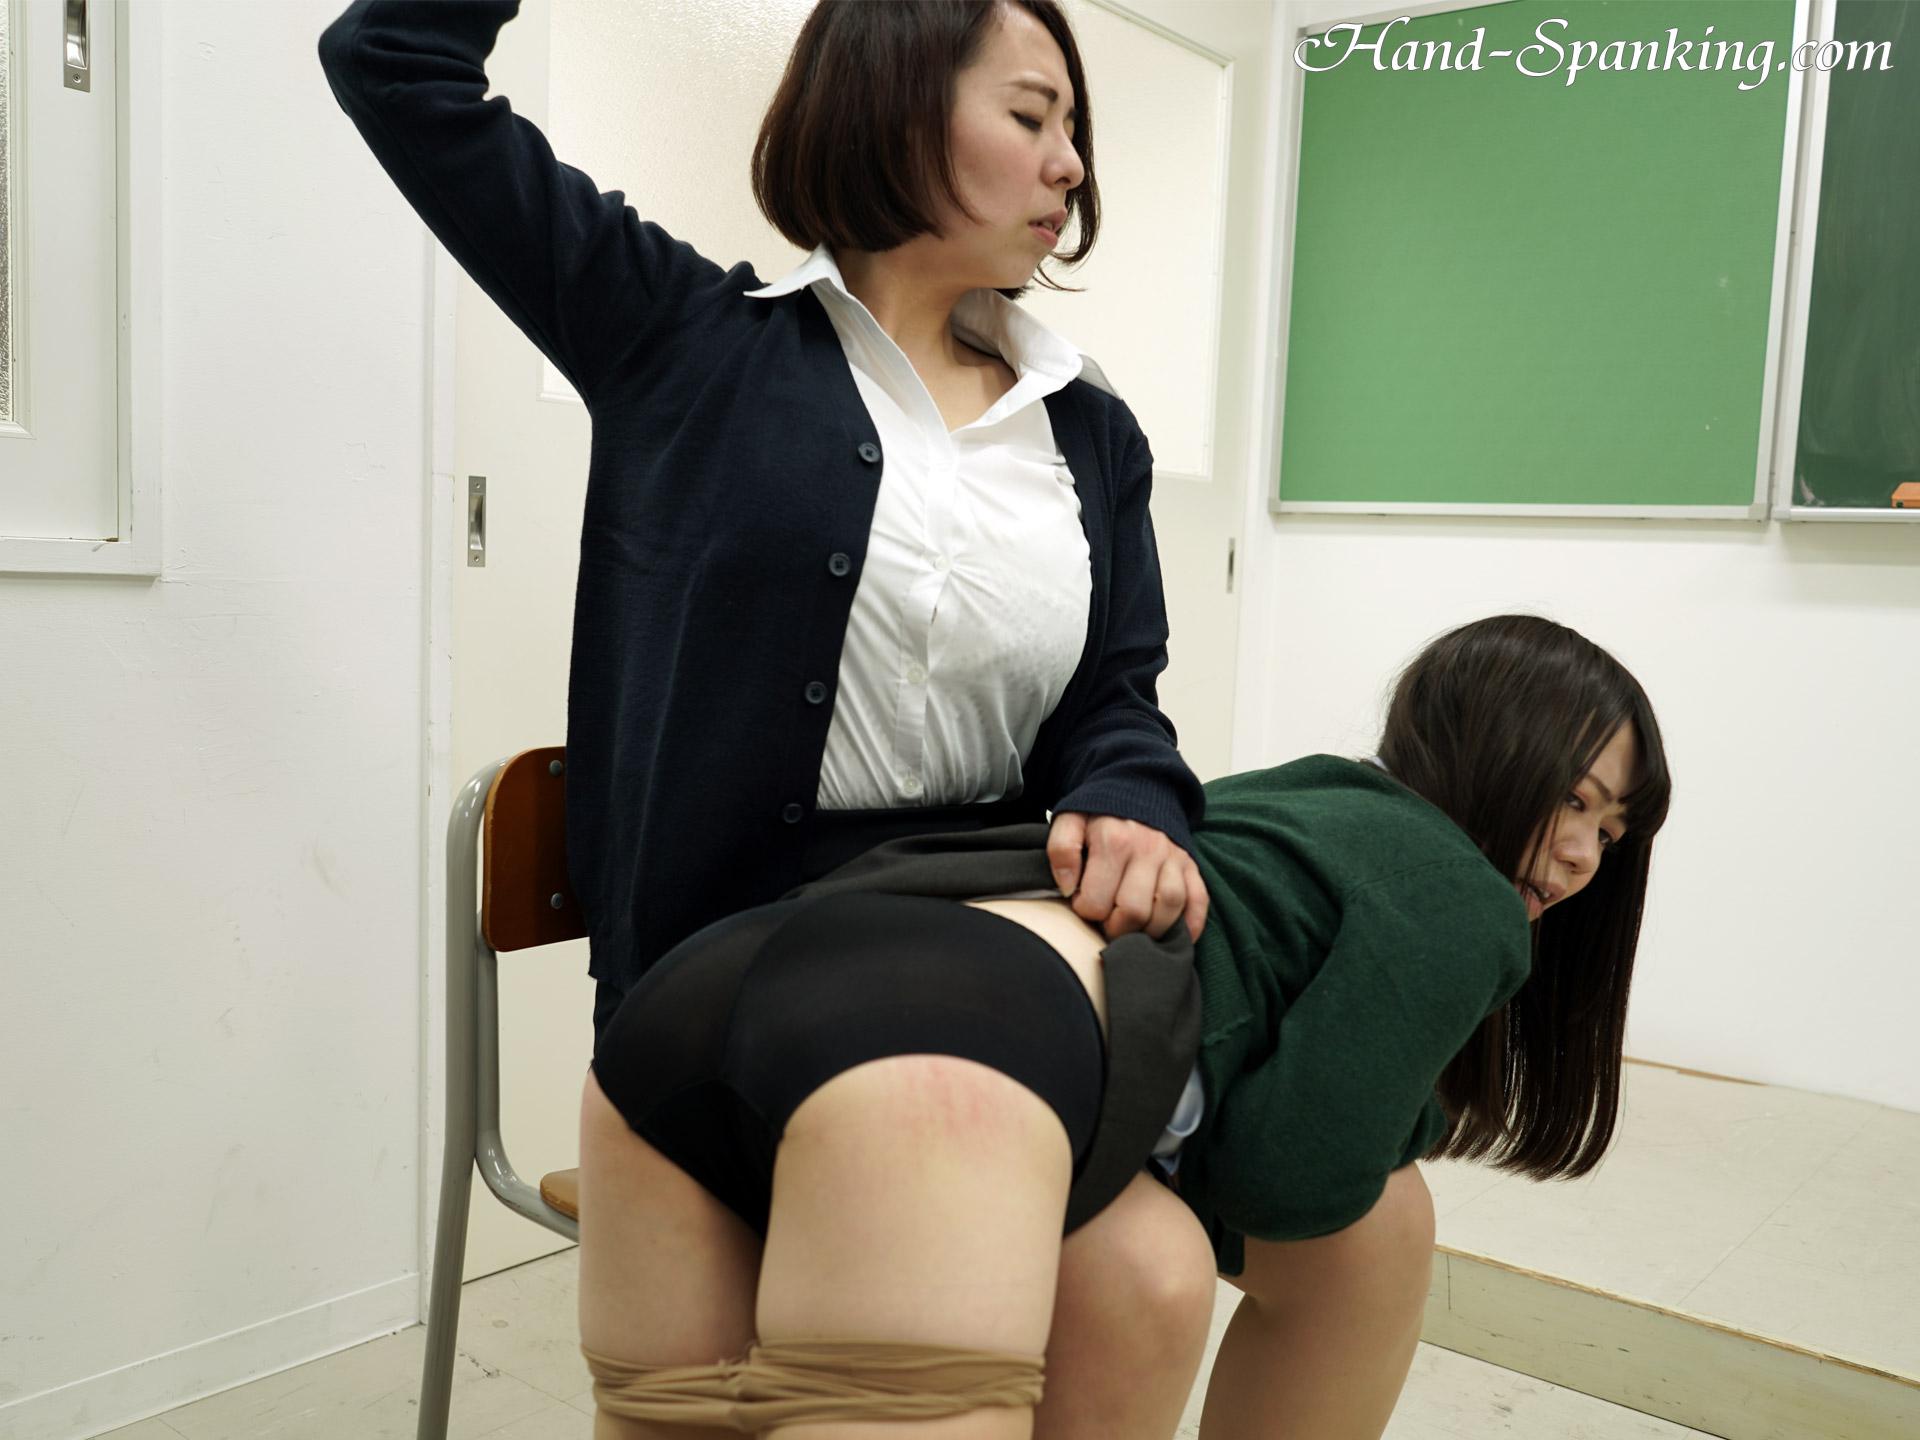 Girls-Spanked-@-Sound-Punishment Only Spanking